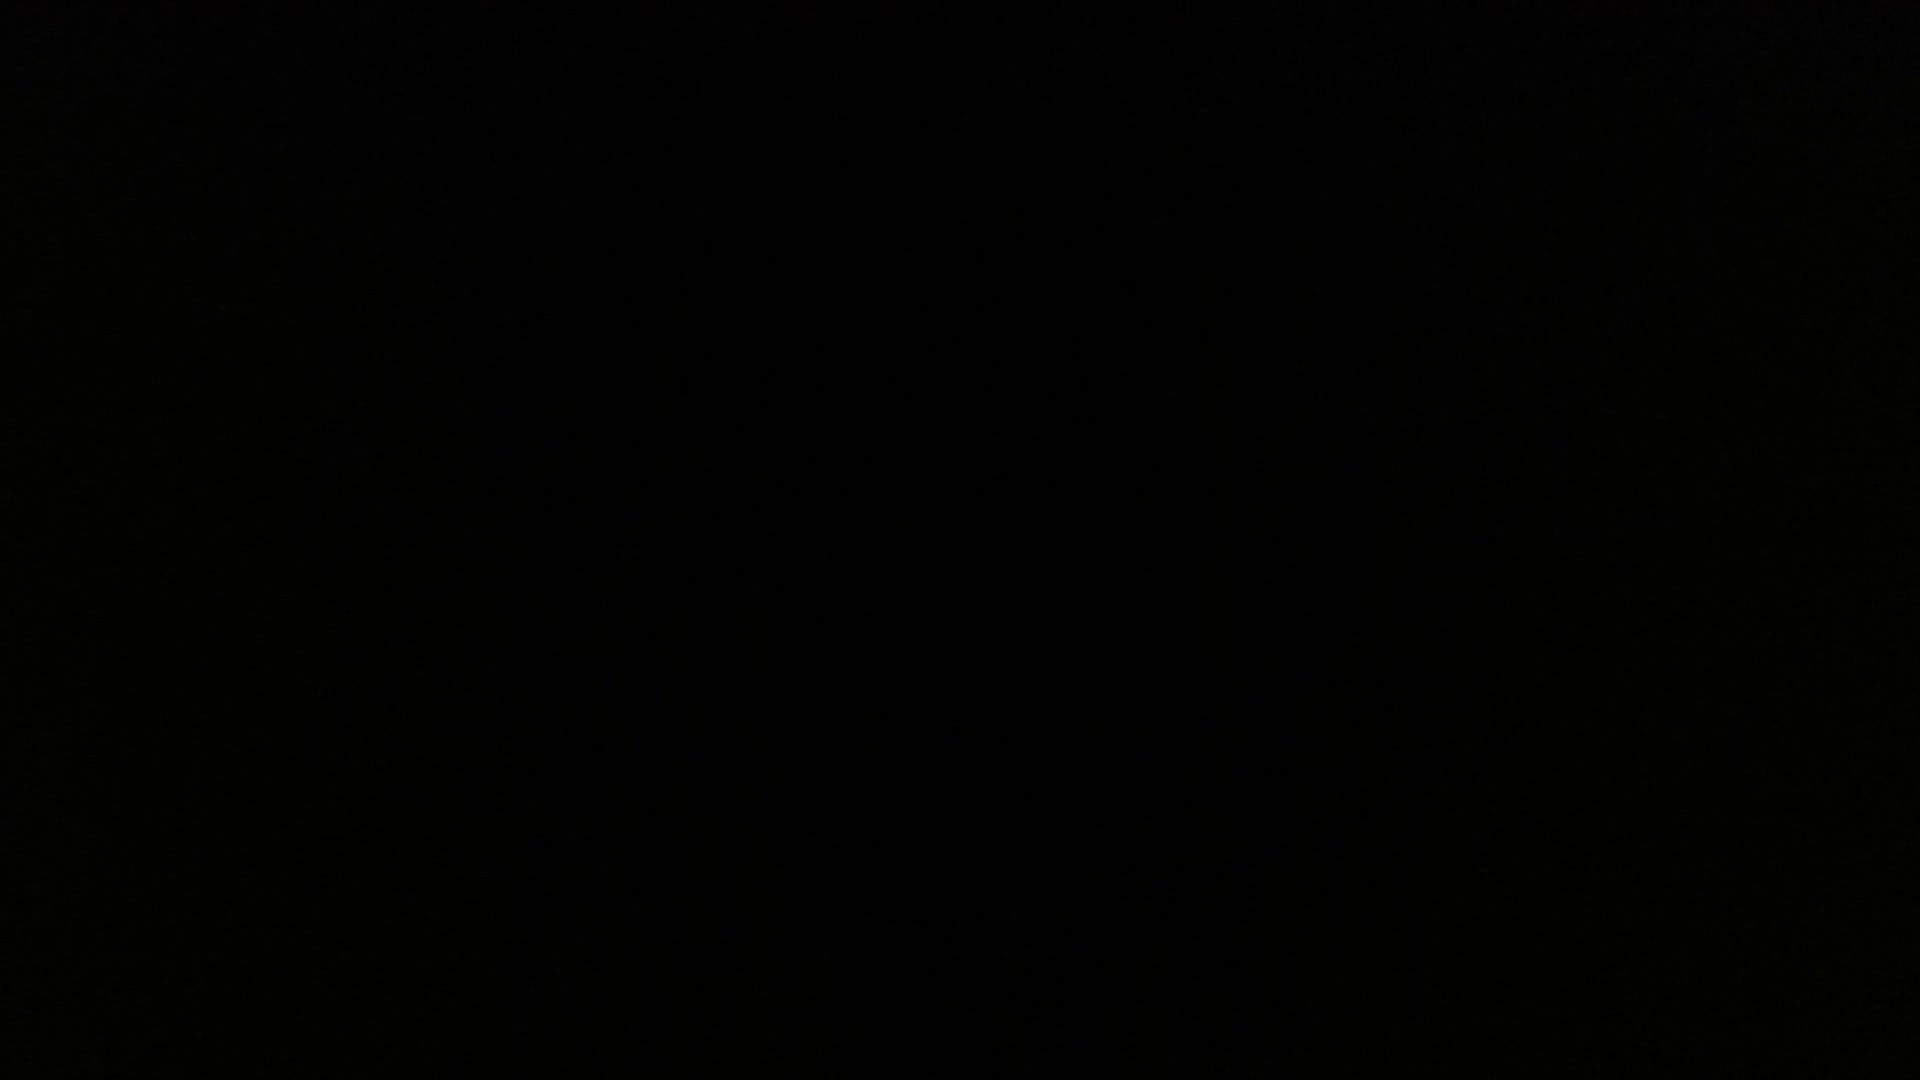 SPYさん初投稿!マンション覗き!5000K!ハイビジョン撮影VOL.03(元野球部社会人編) 完全無修正  109pic 40